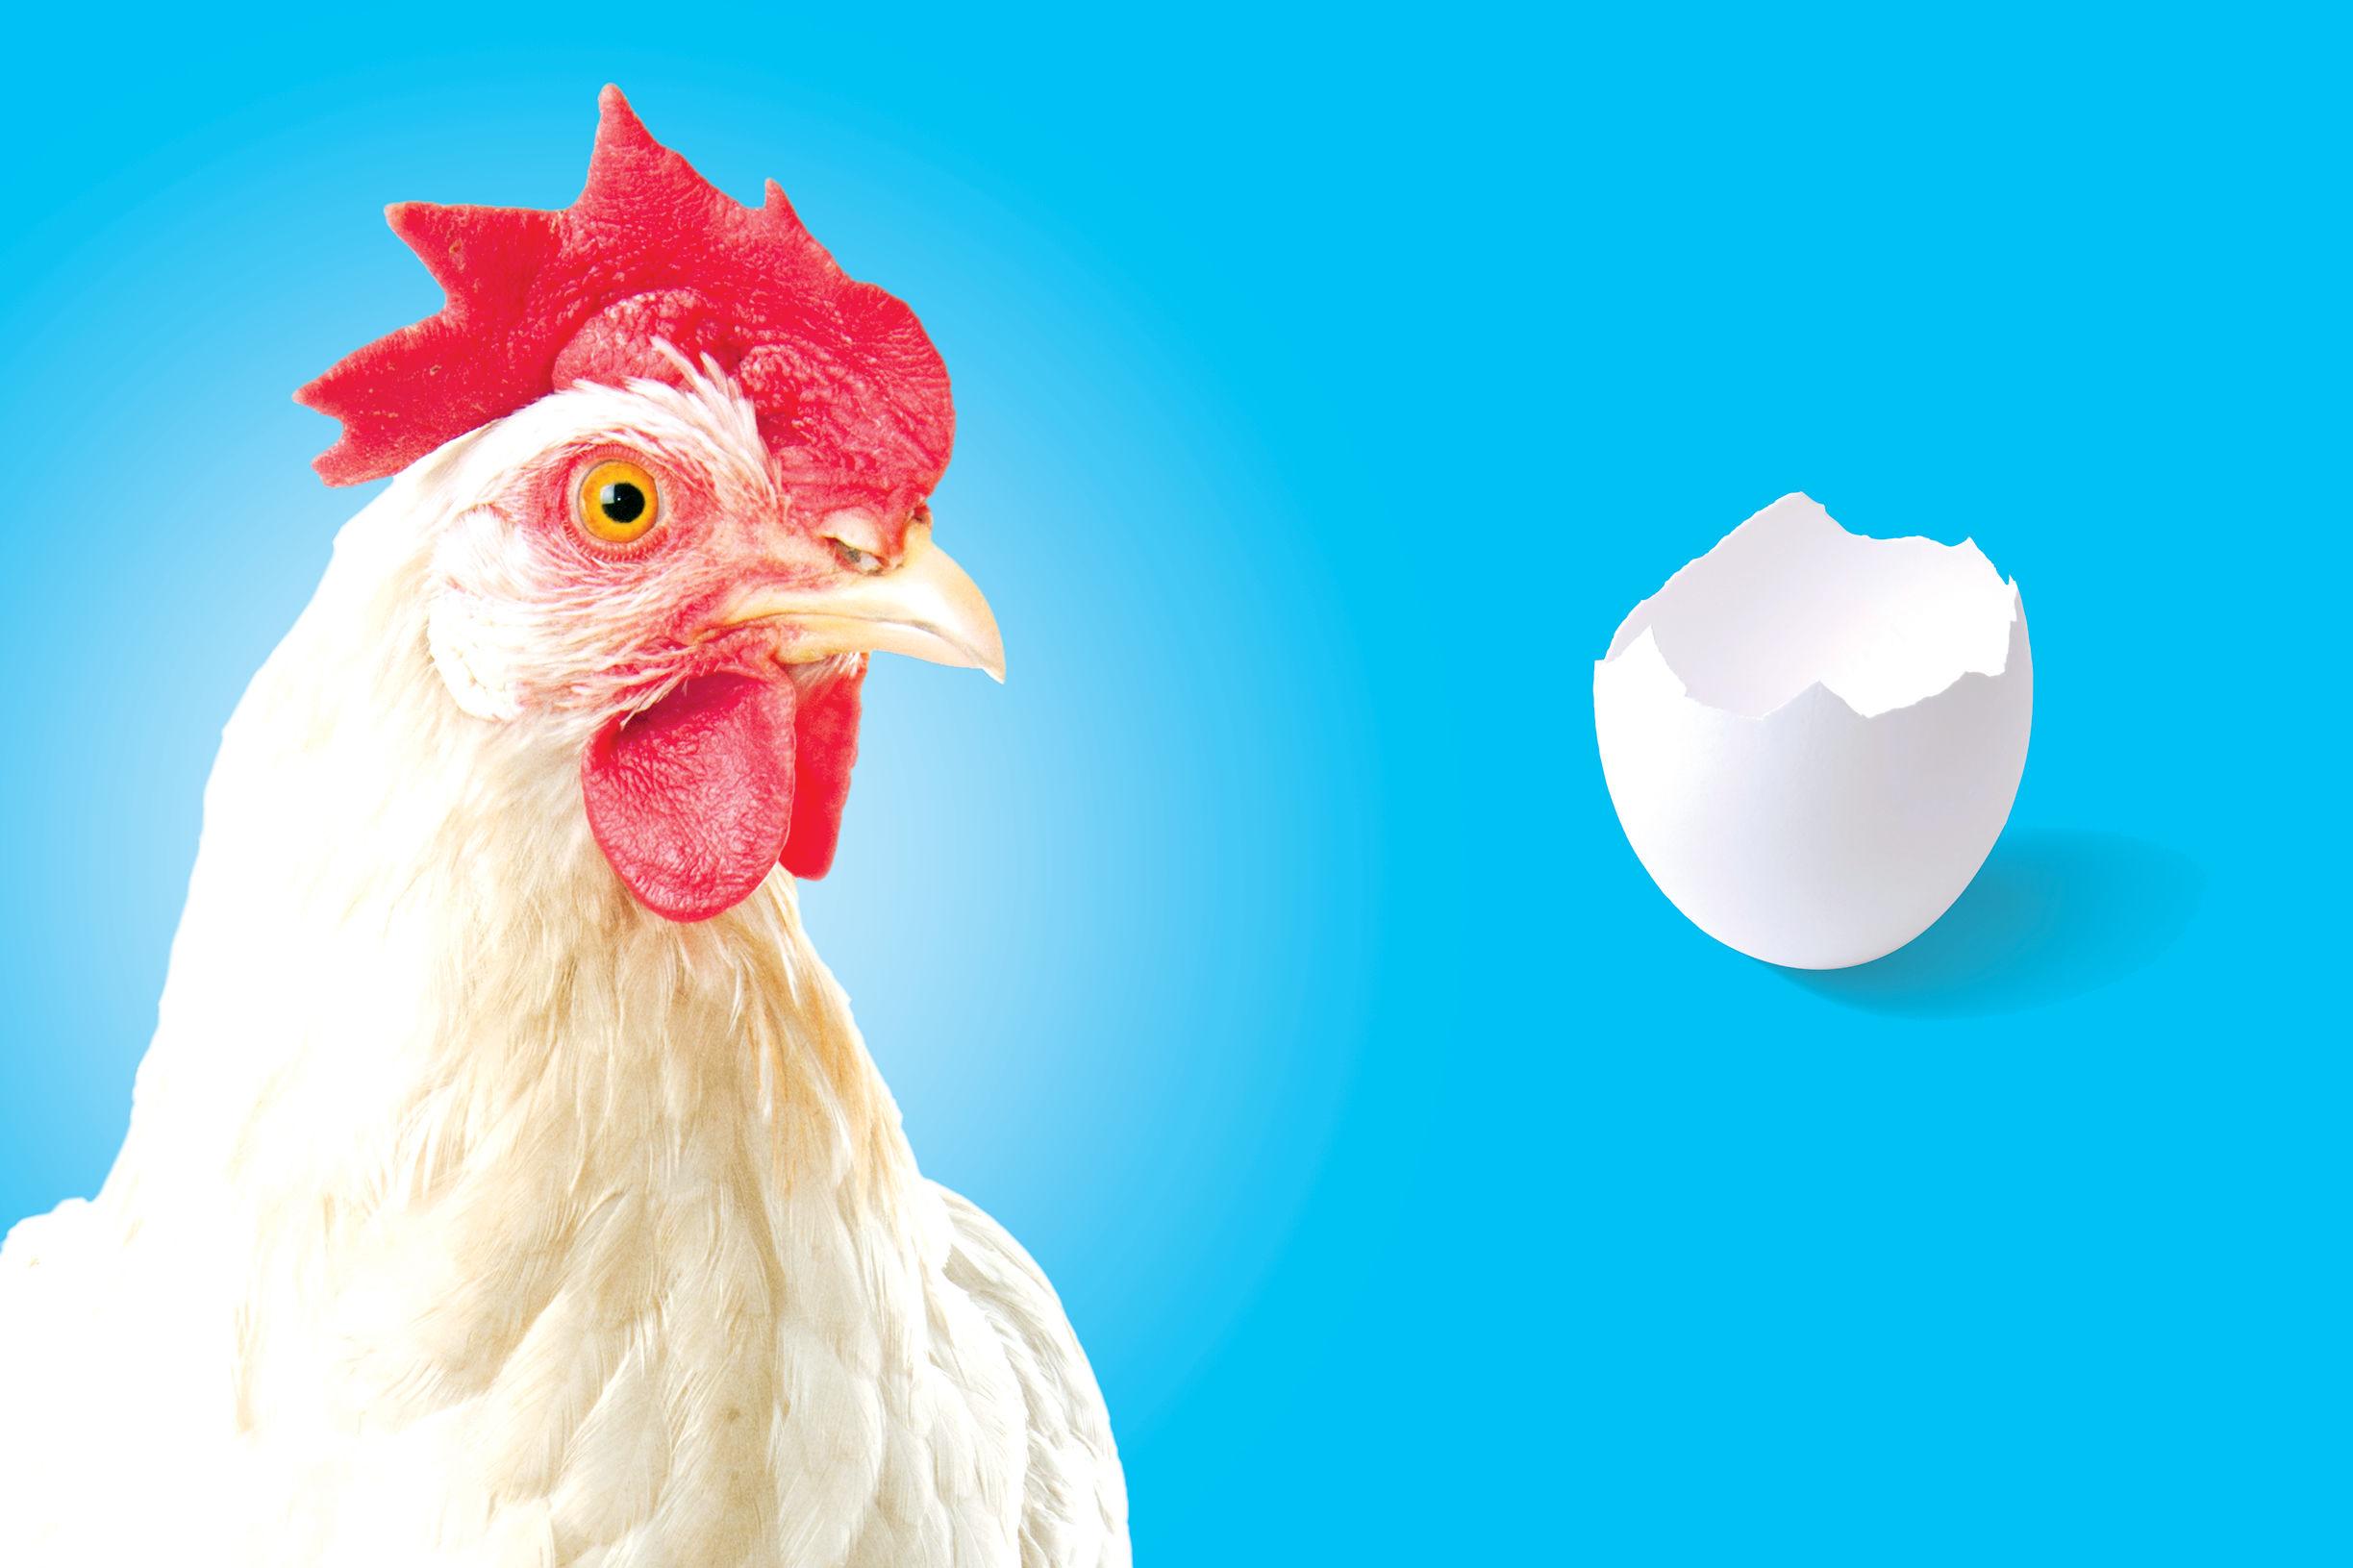 0915 chickens wr1dpi